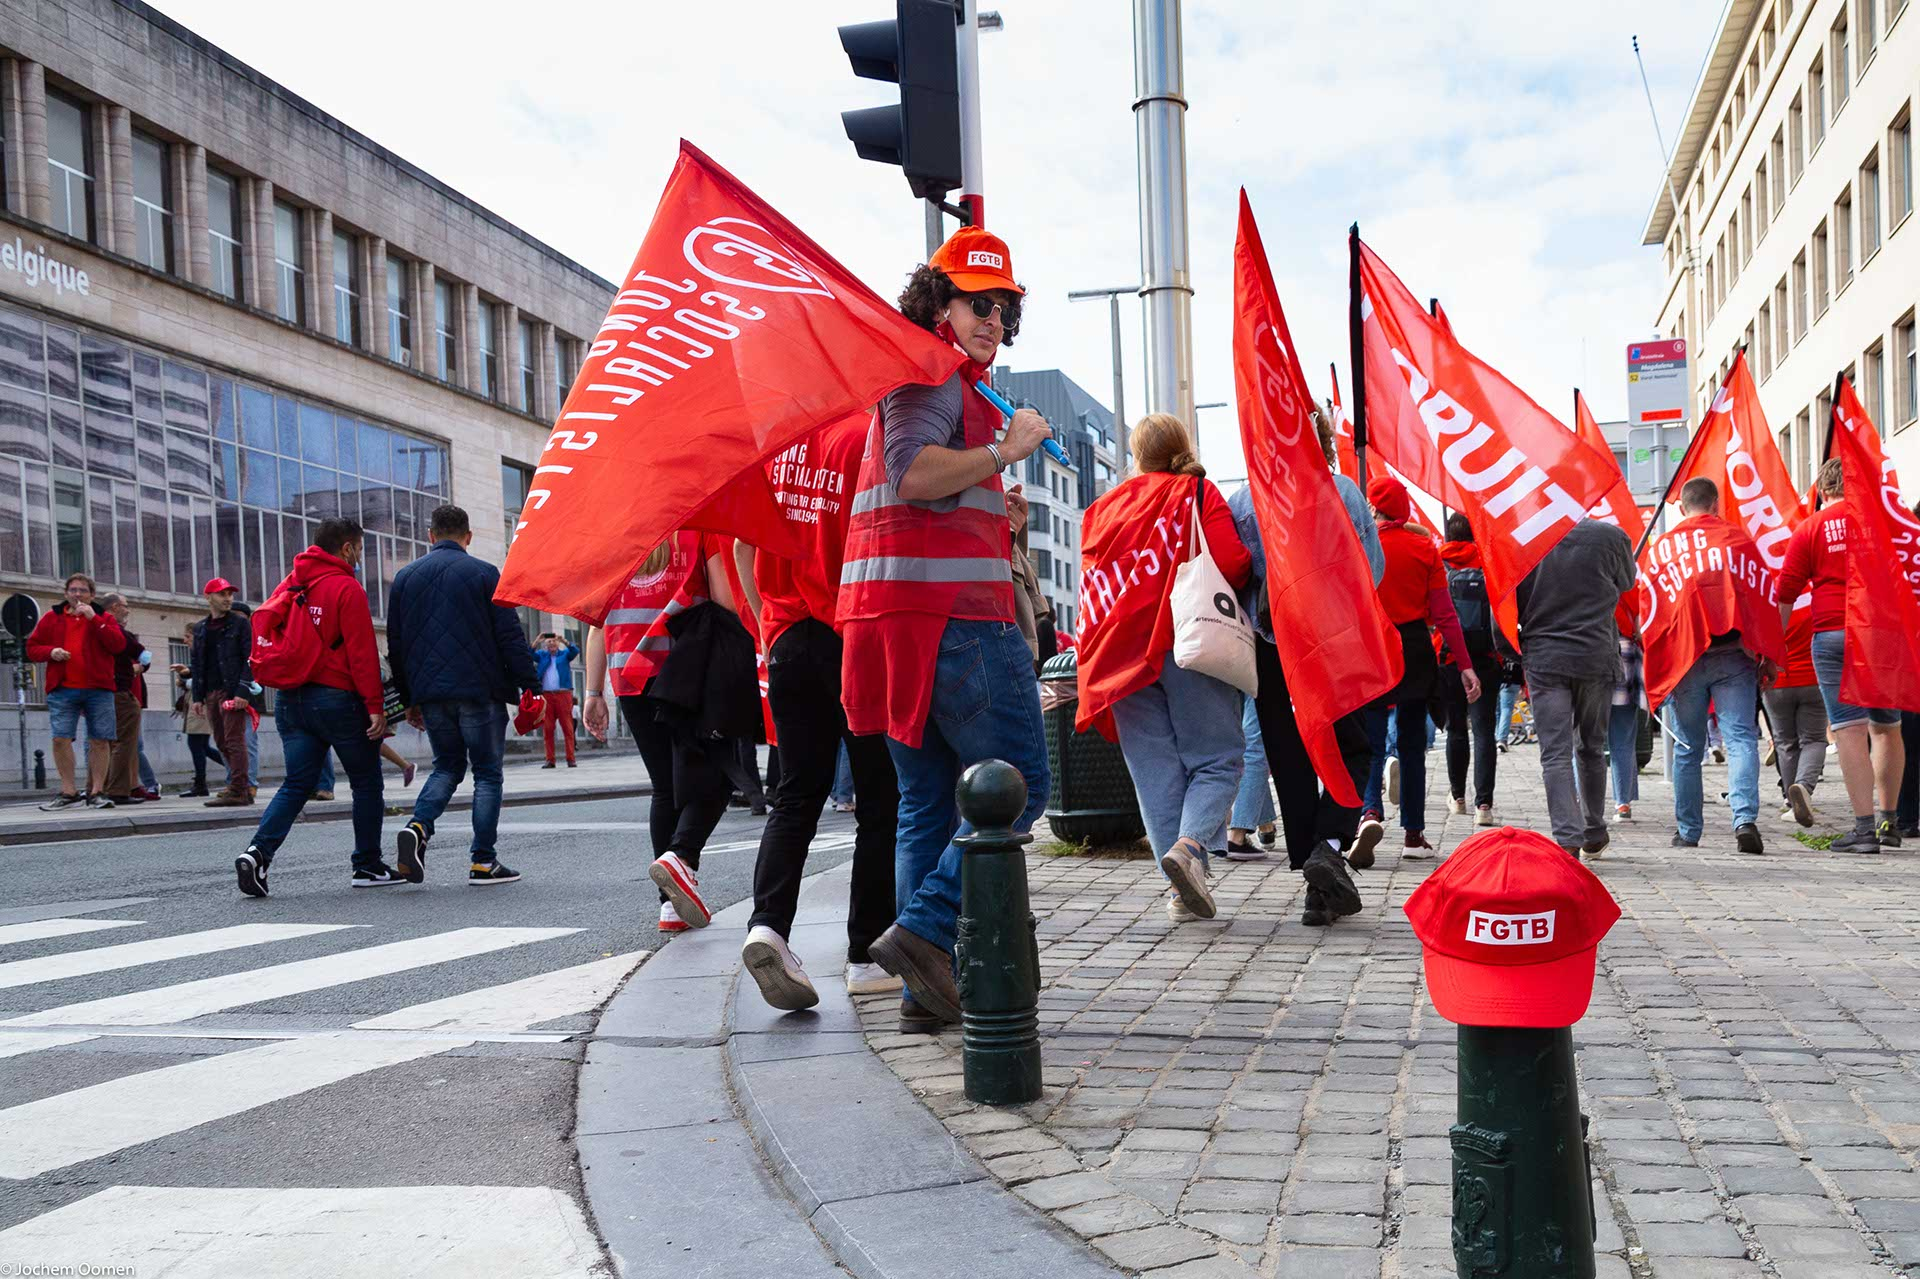 National strike Brussels (photo: Jochem Oomen)